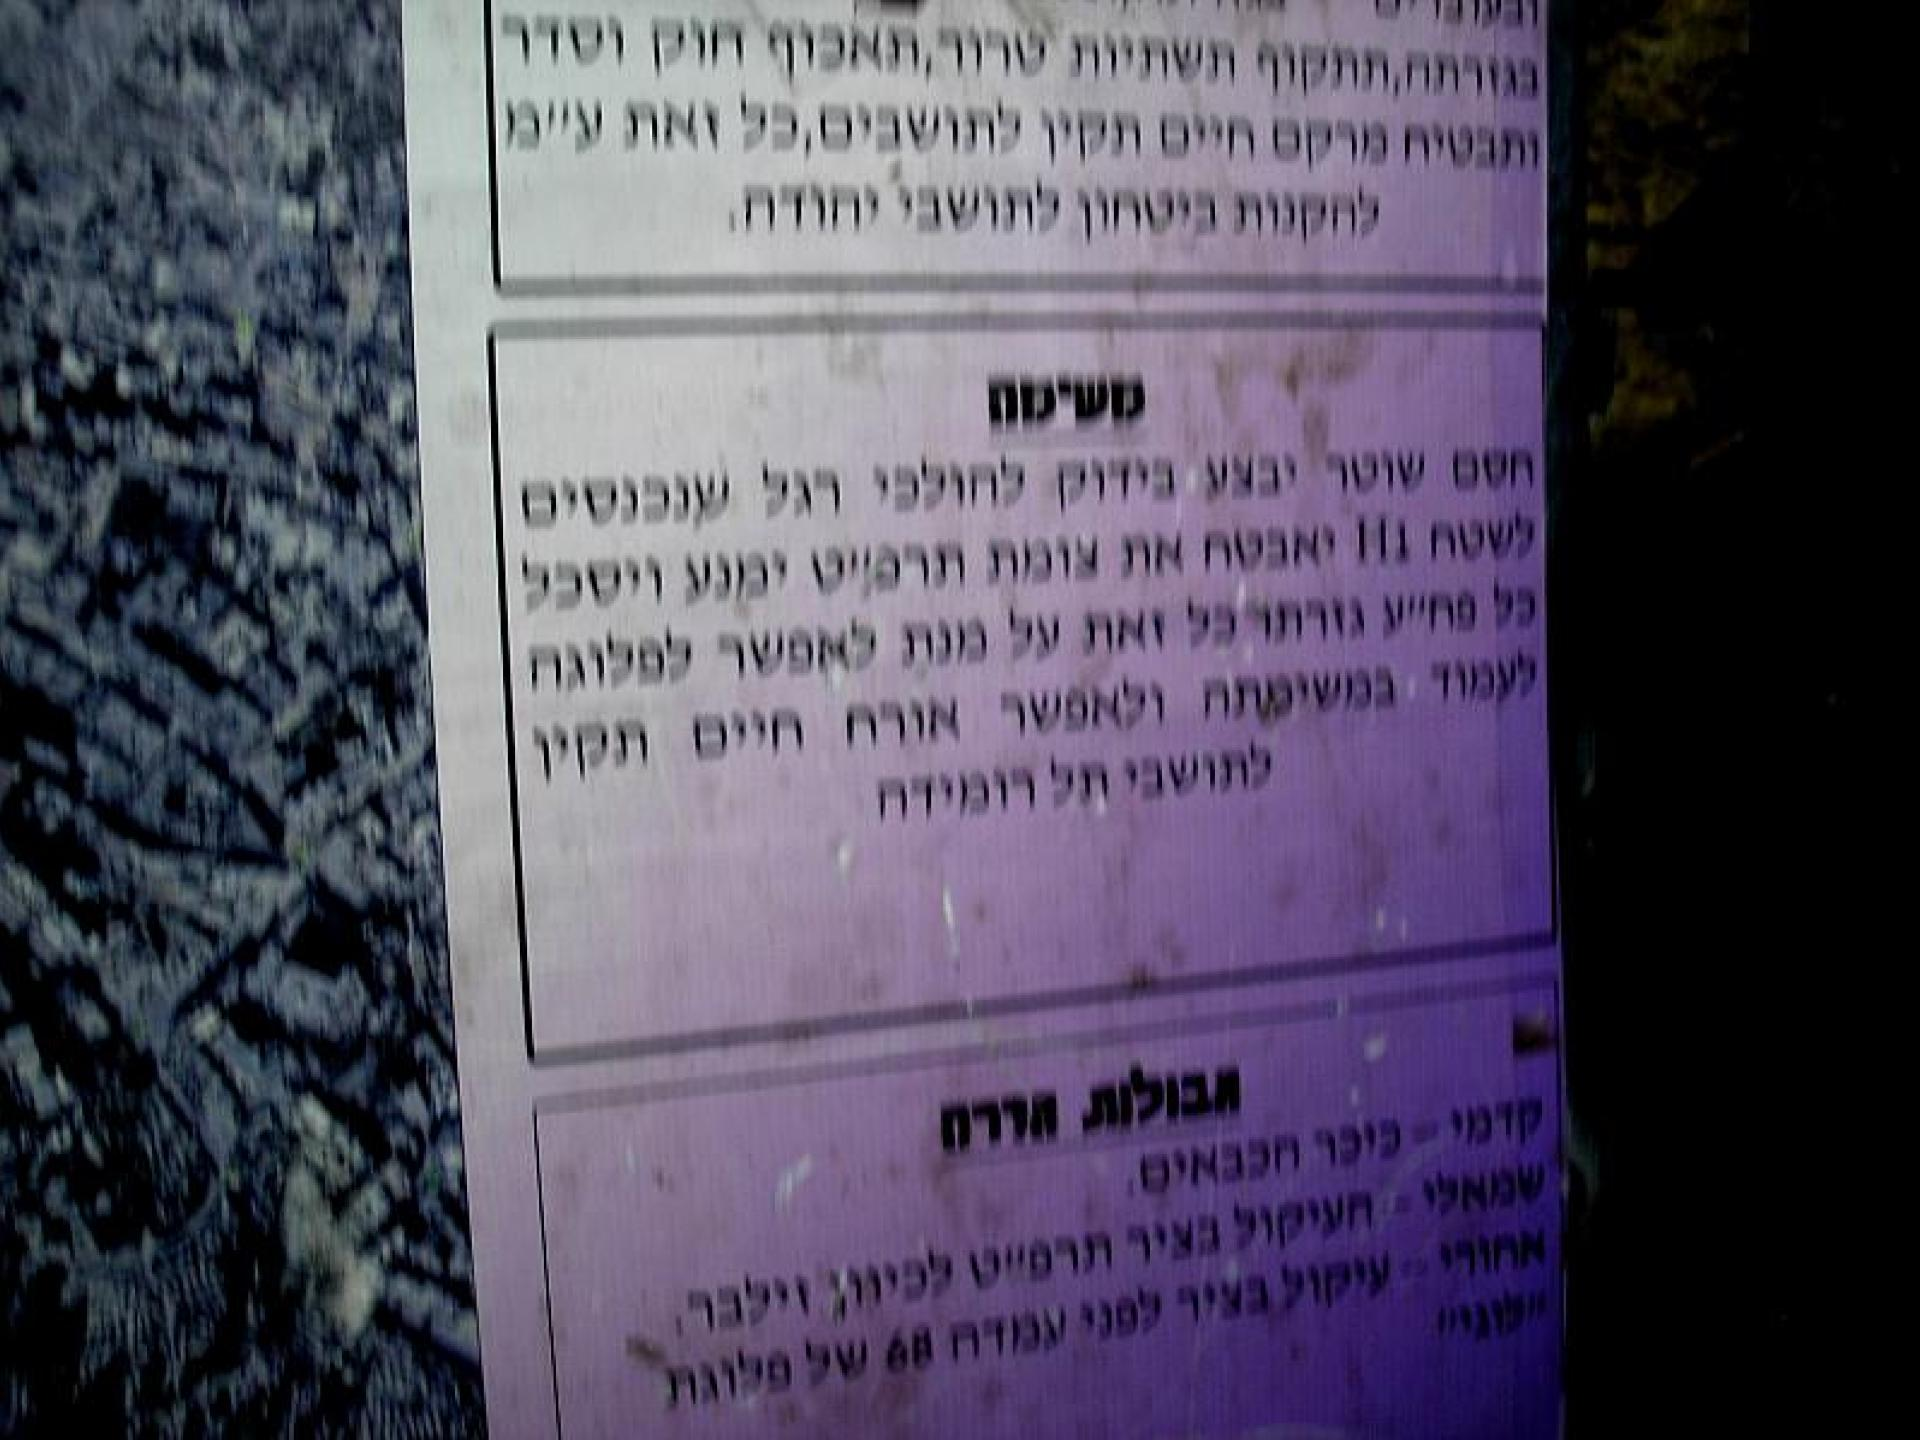 Hebron 11.02.09